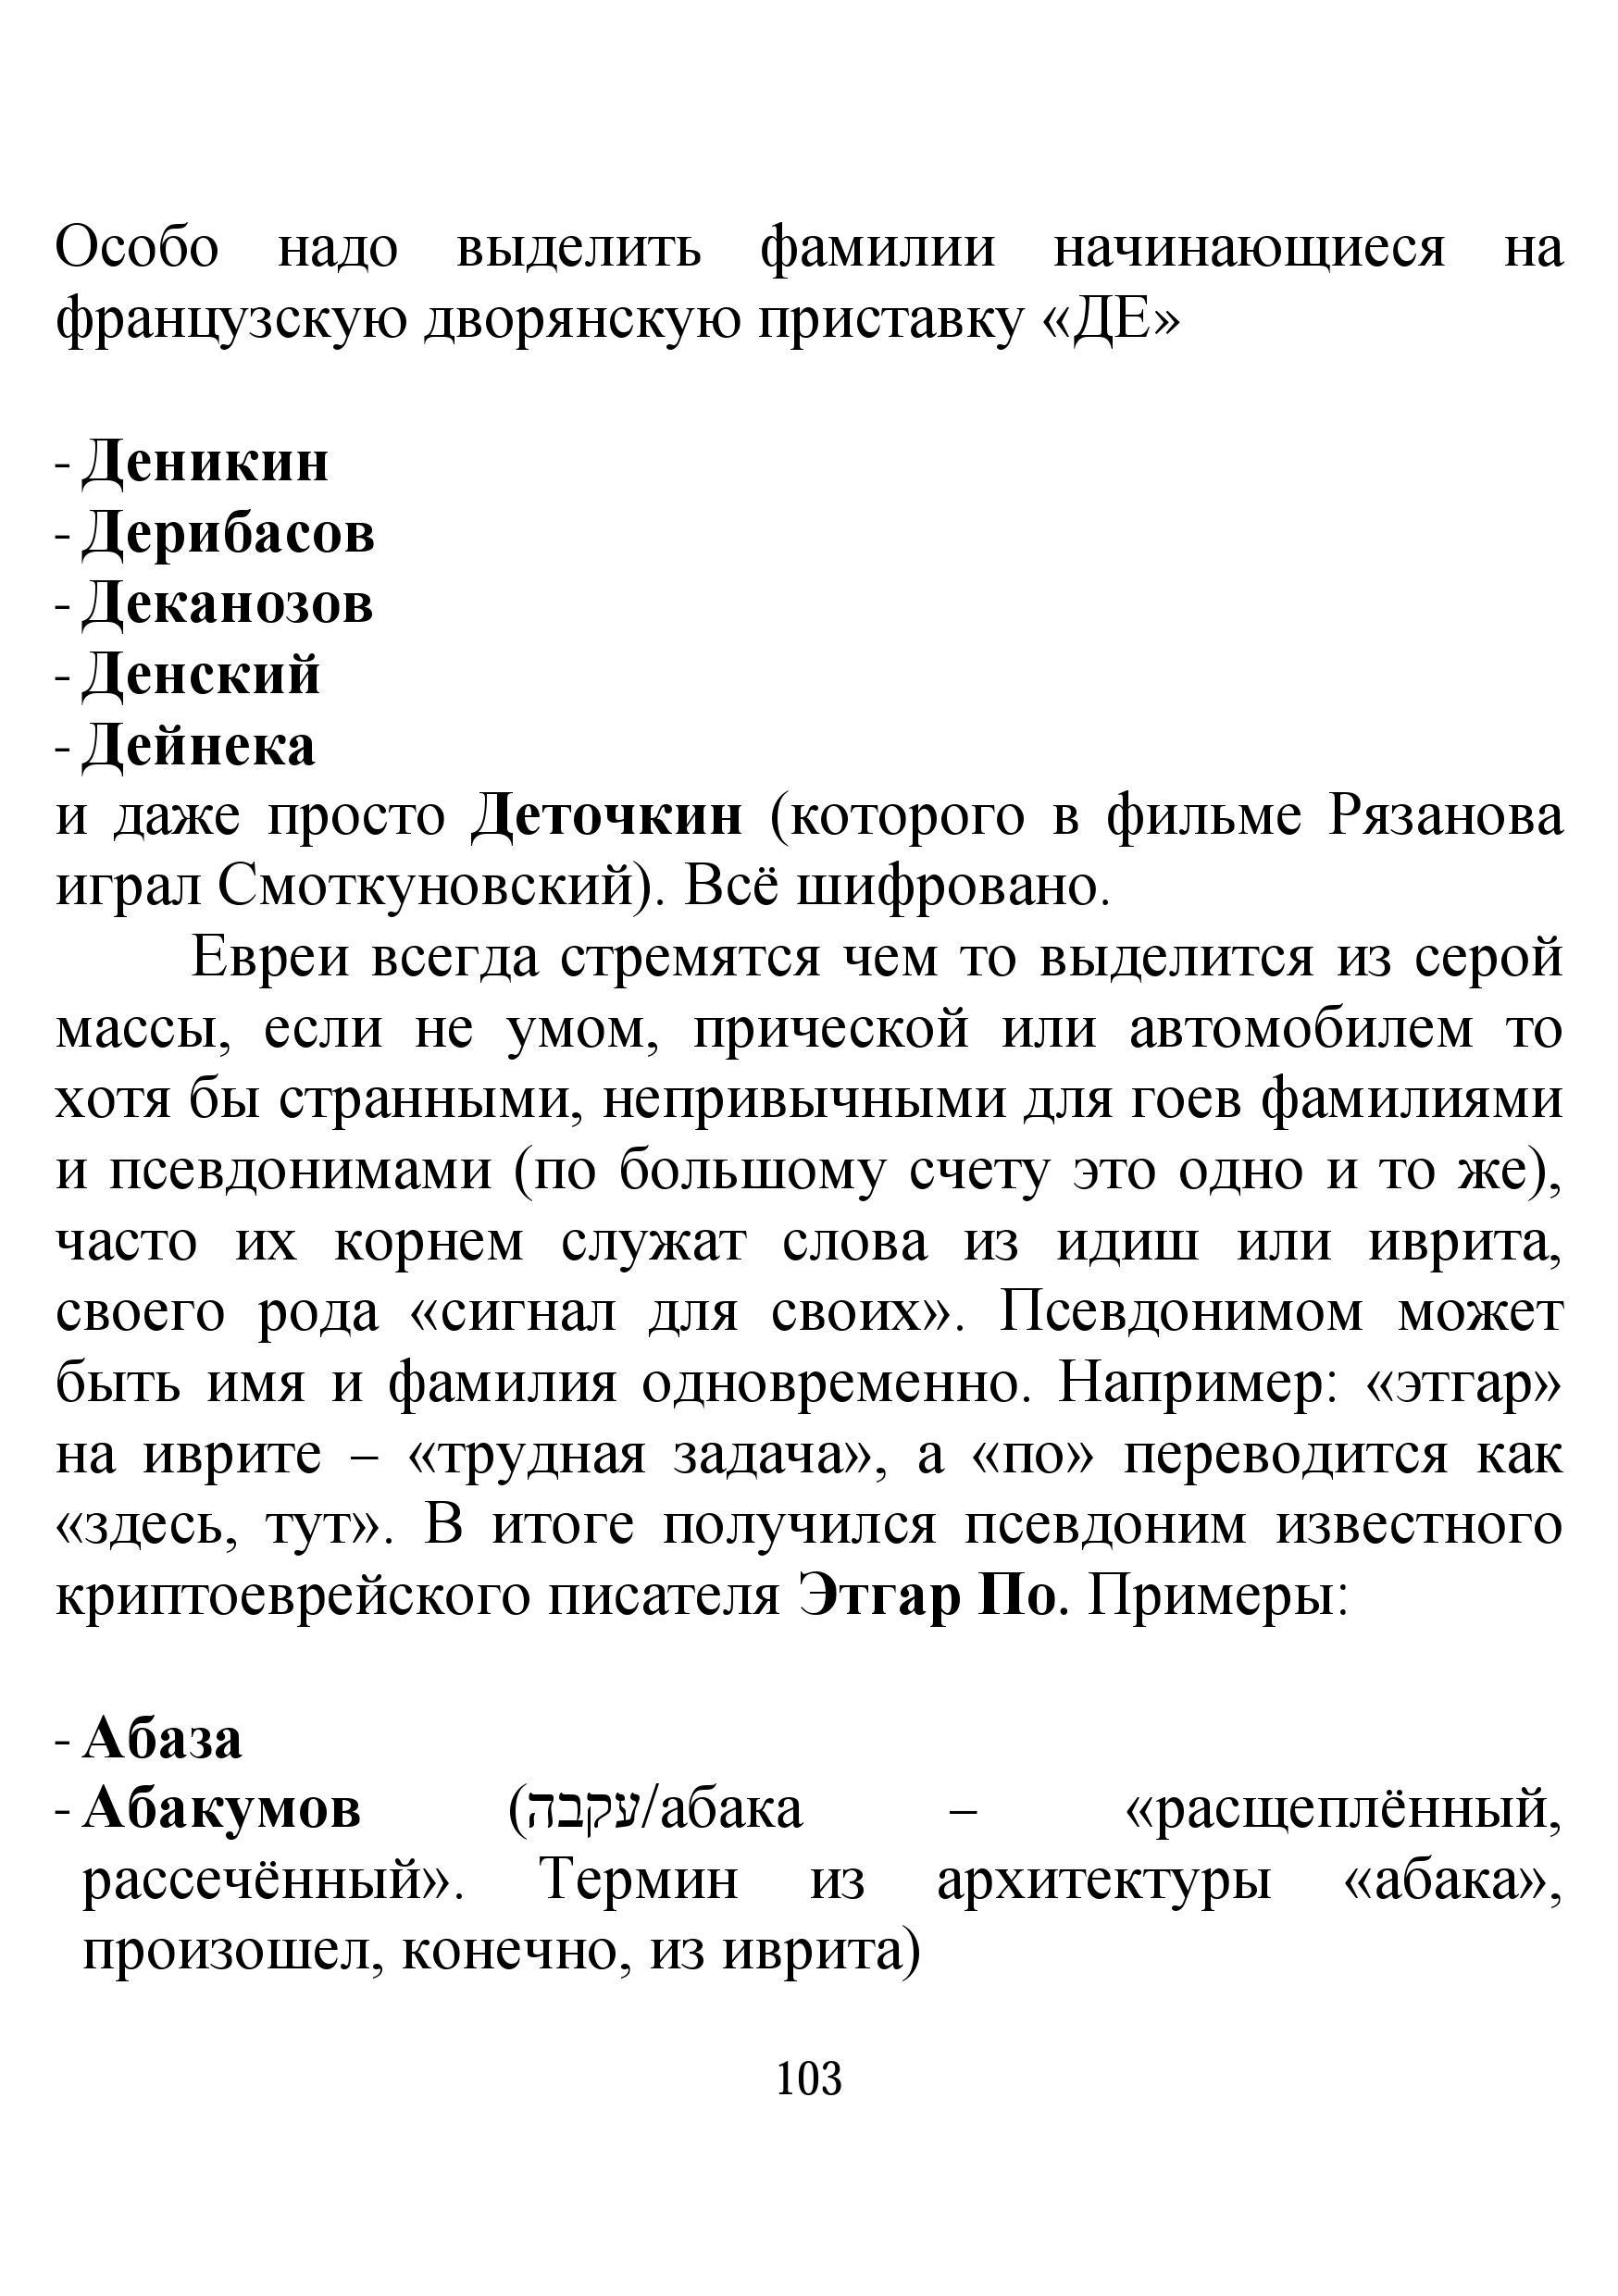 http://sa.uploads.ru/5xjo1.jpg